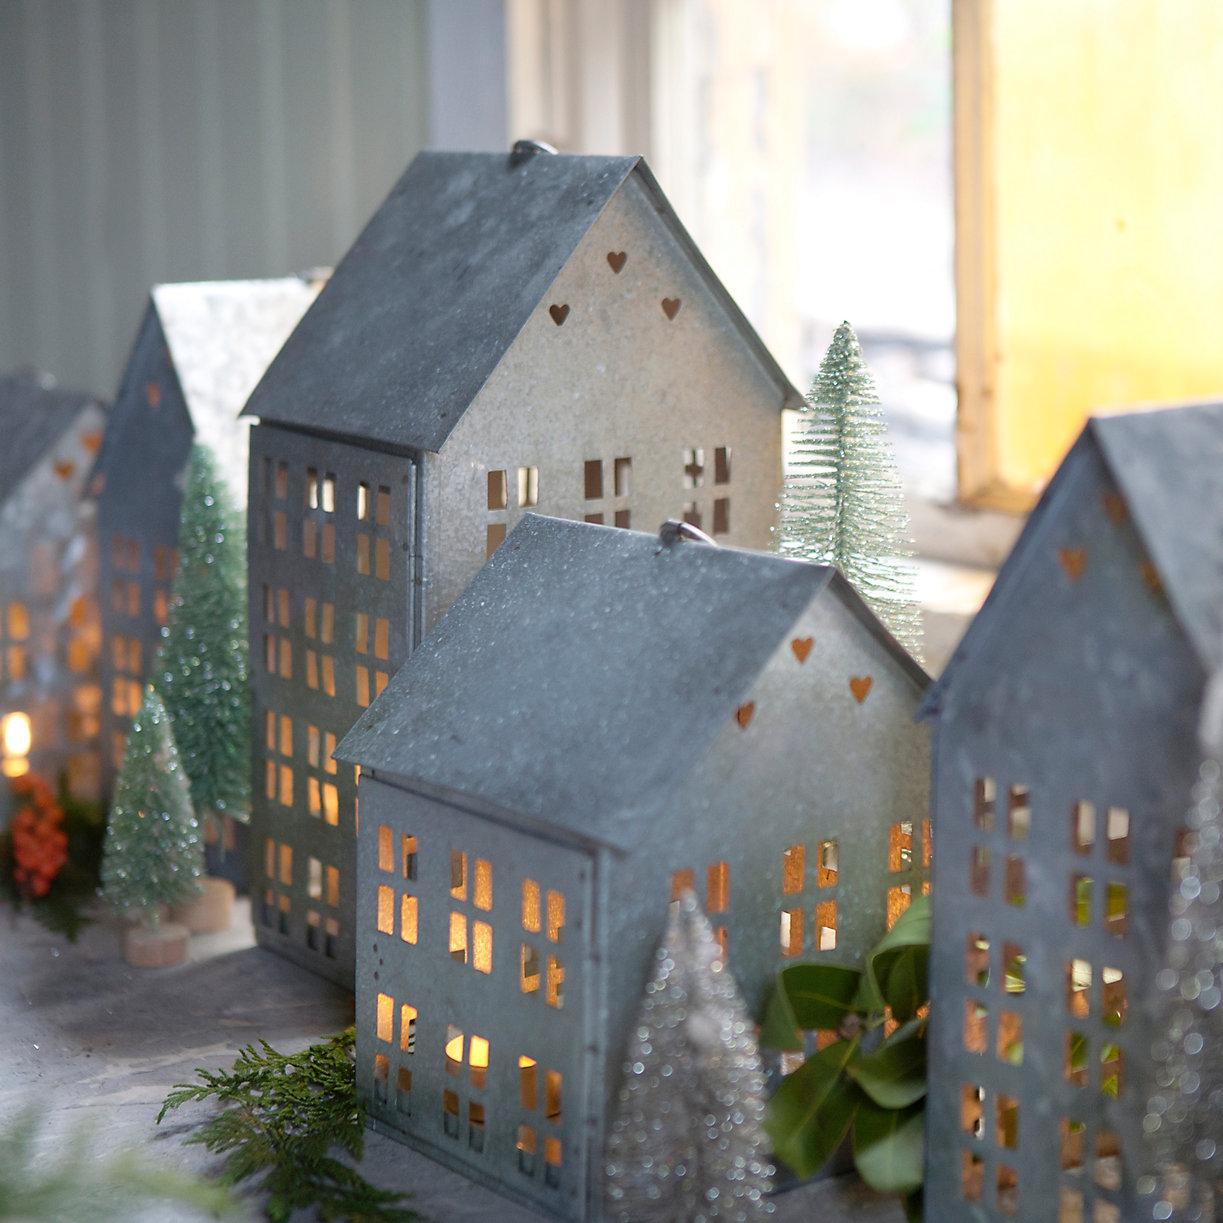 lights village house - photo #6